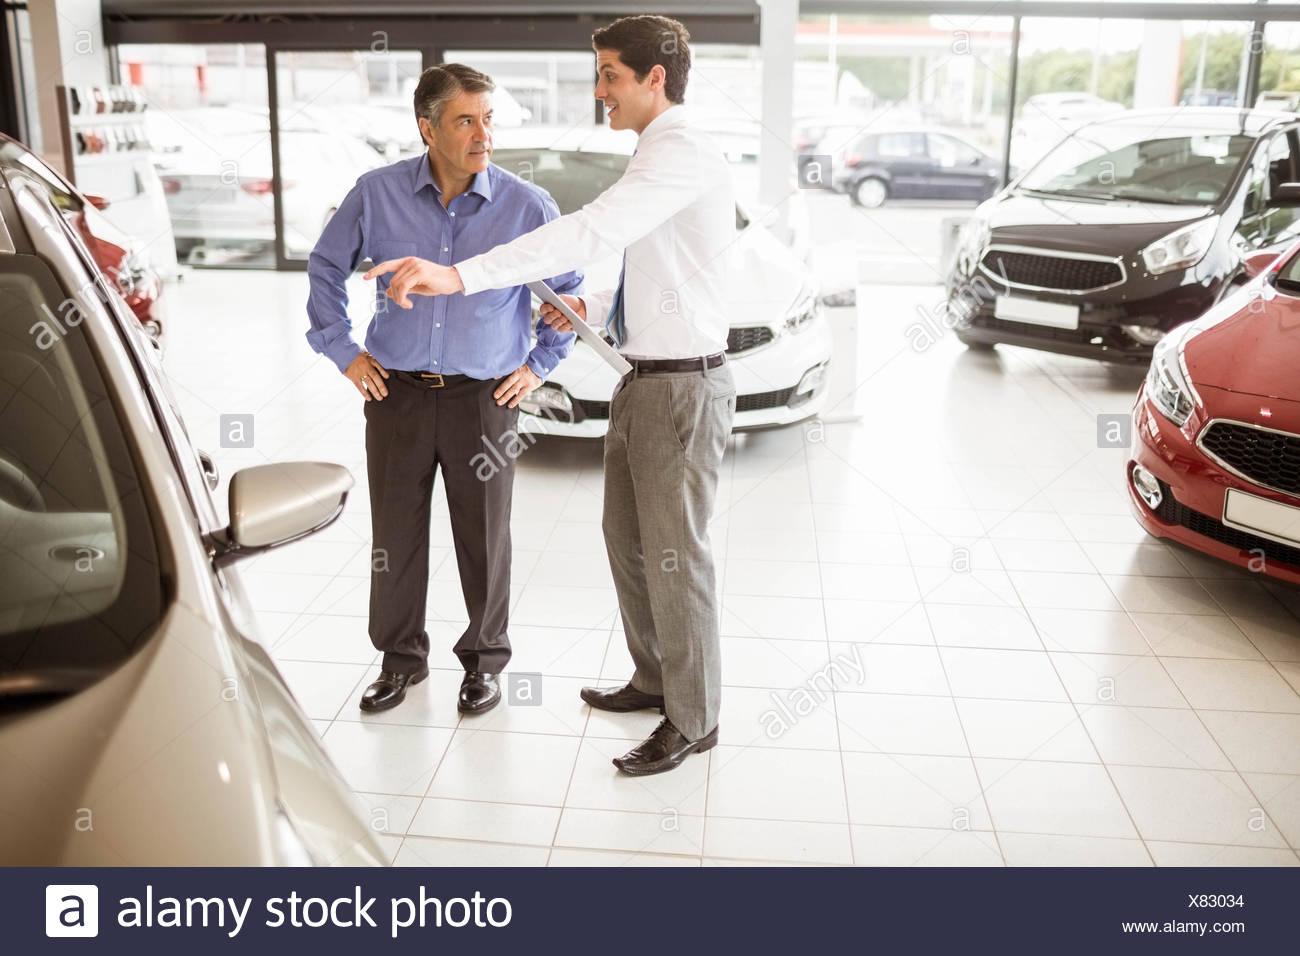 Salesman showing somethings to a man - Stock Image